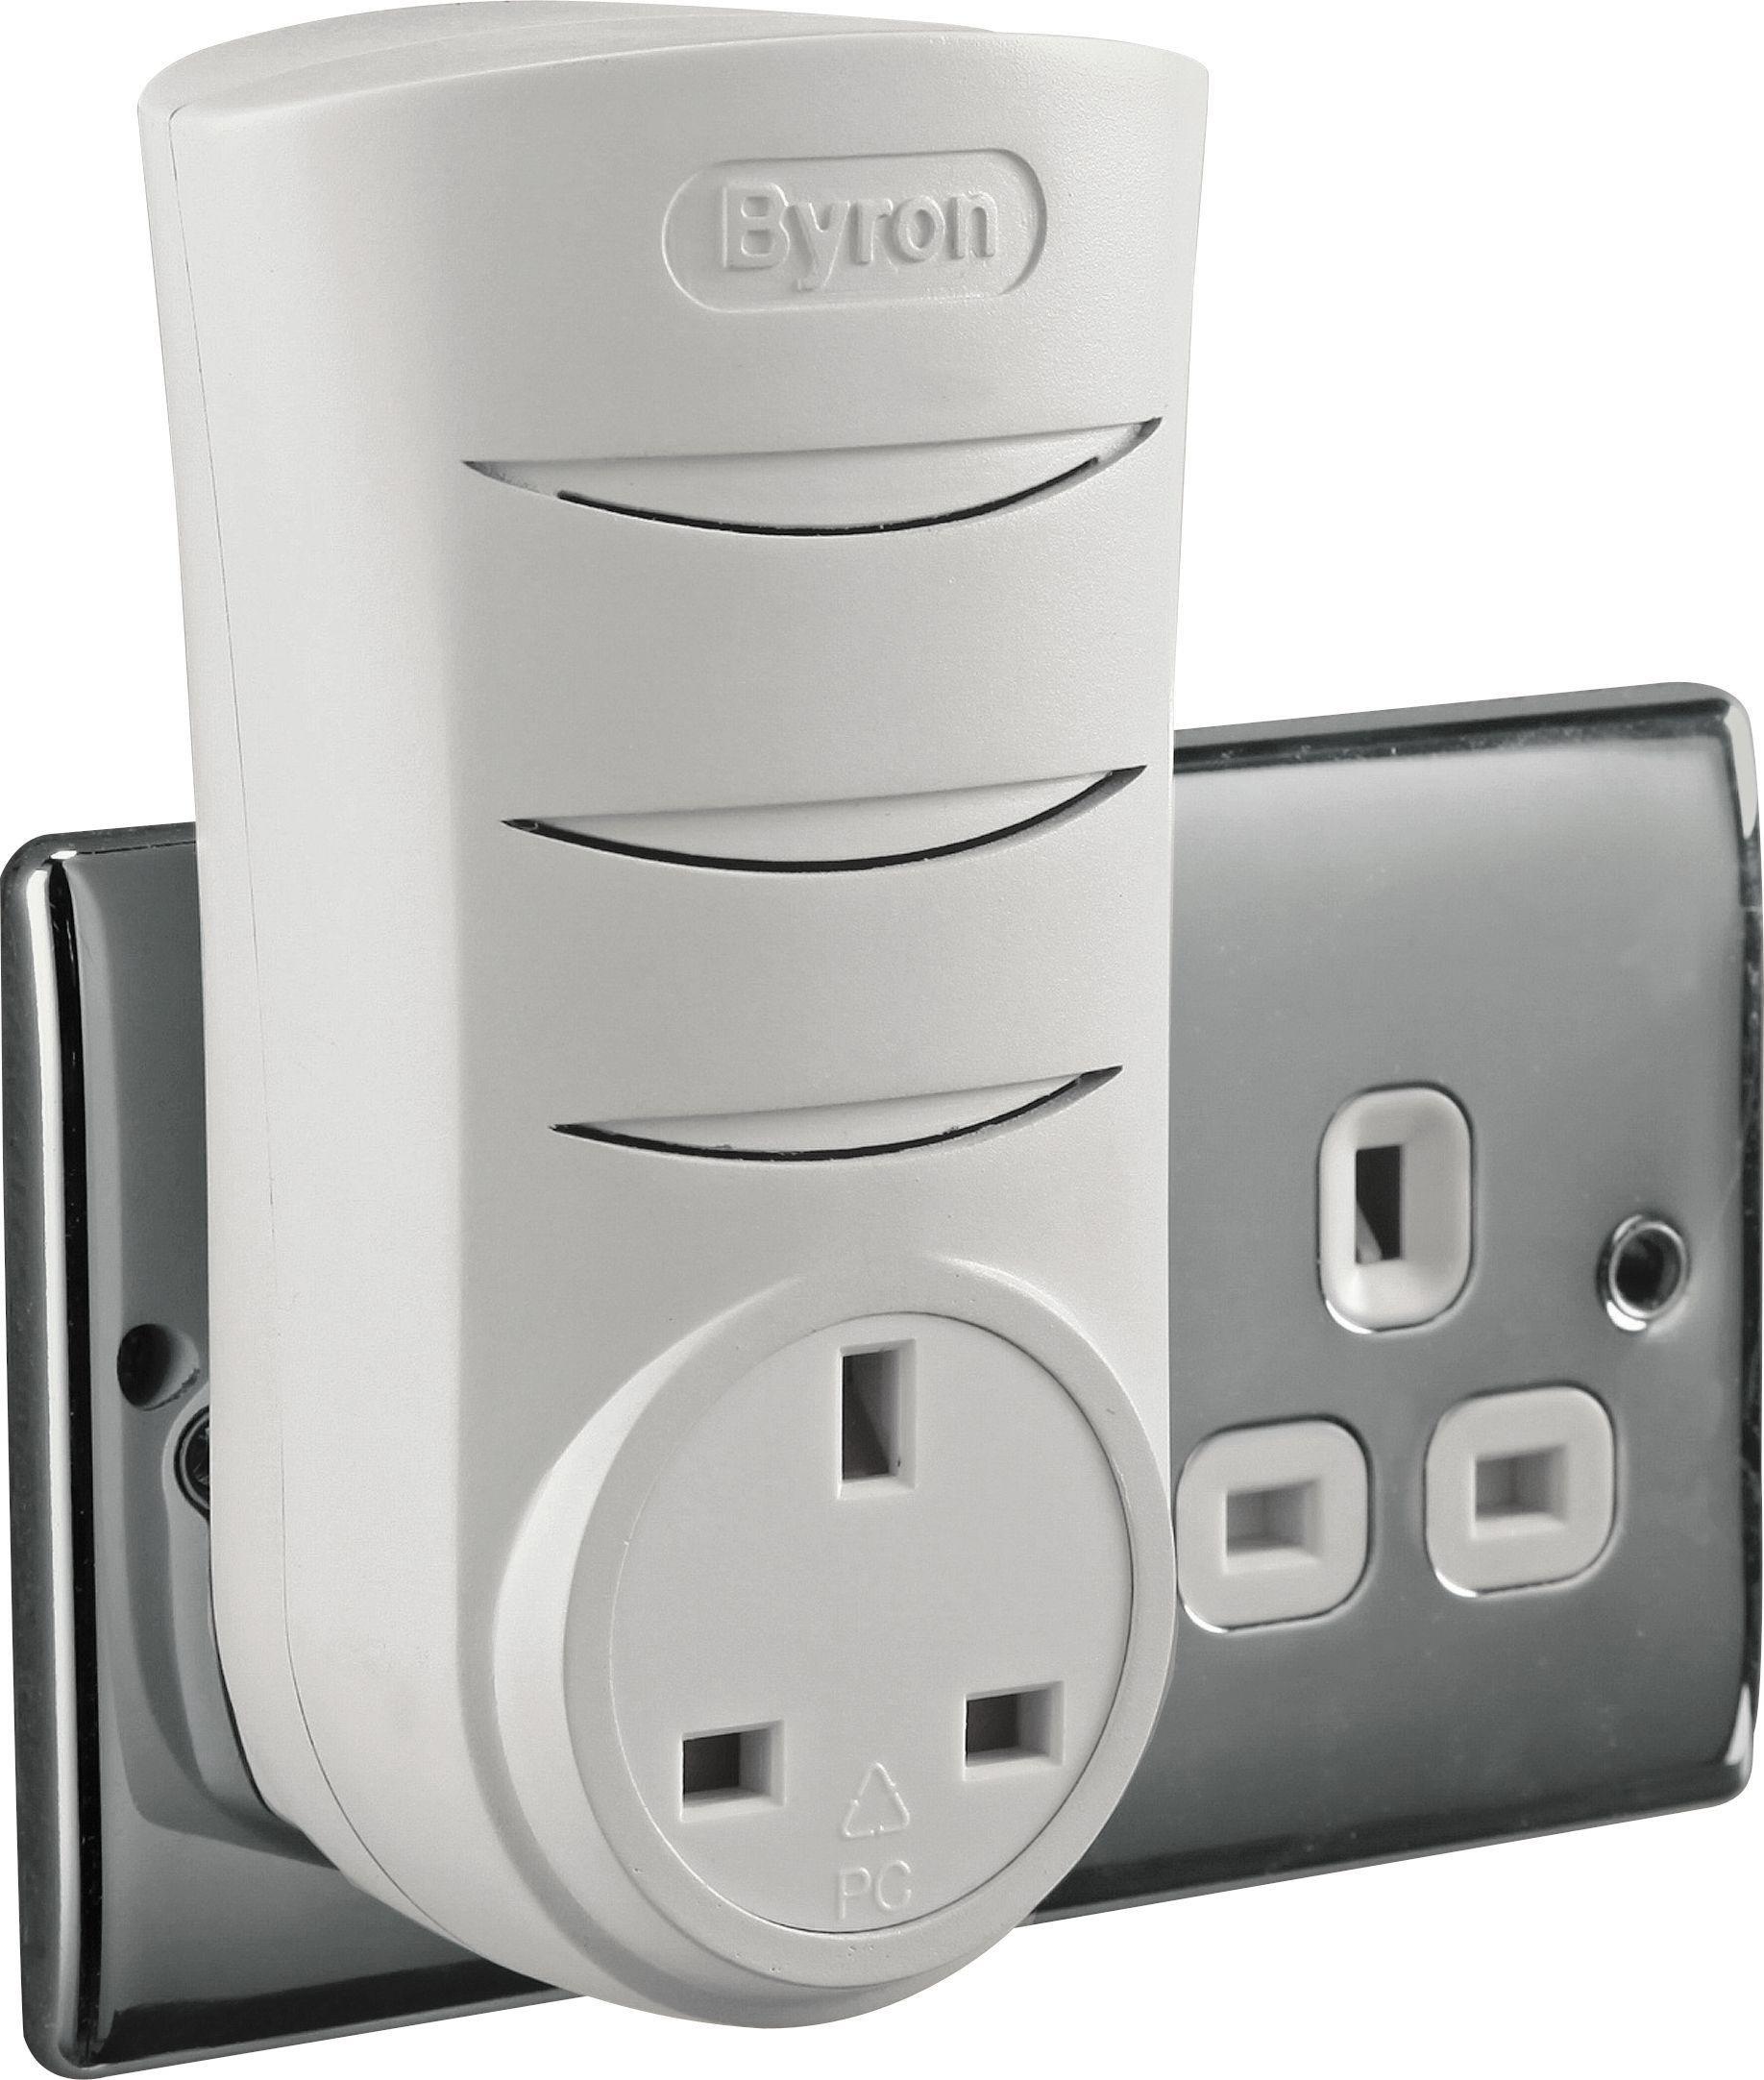 sale on byron white 60m plug through doorbell byron now. Black Bedroom Furniture Sets. Home Design Ideas